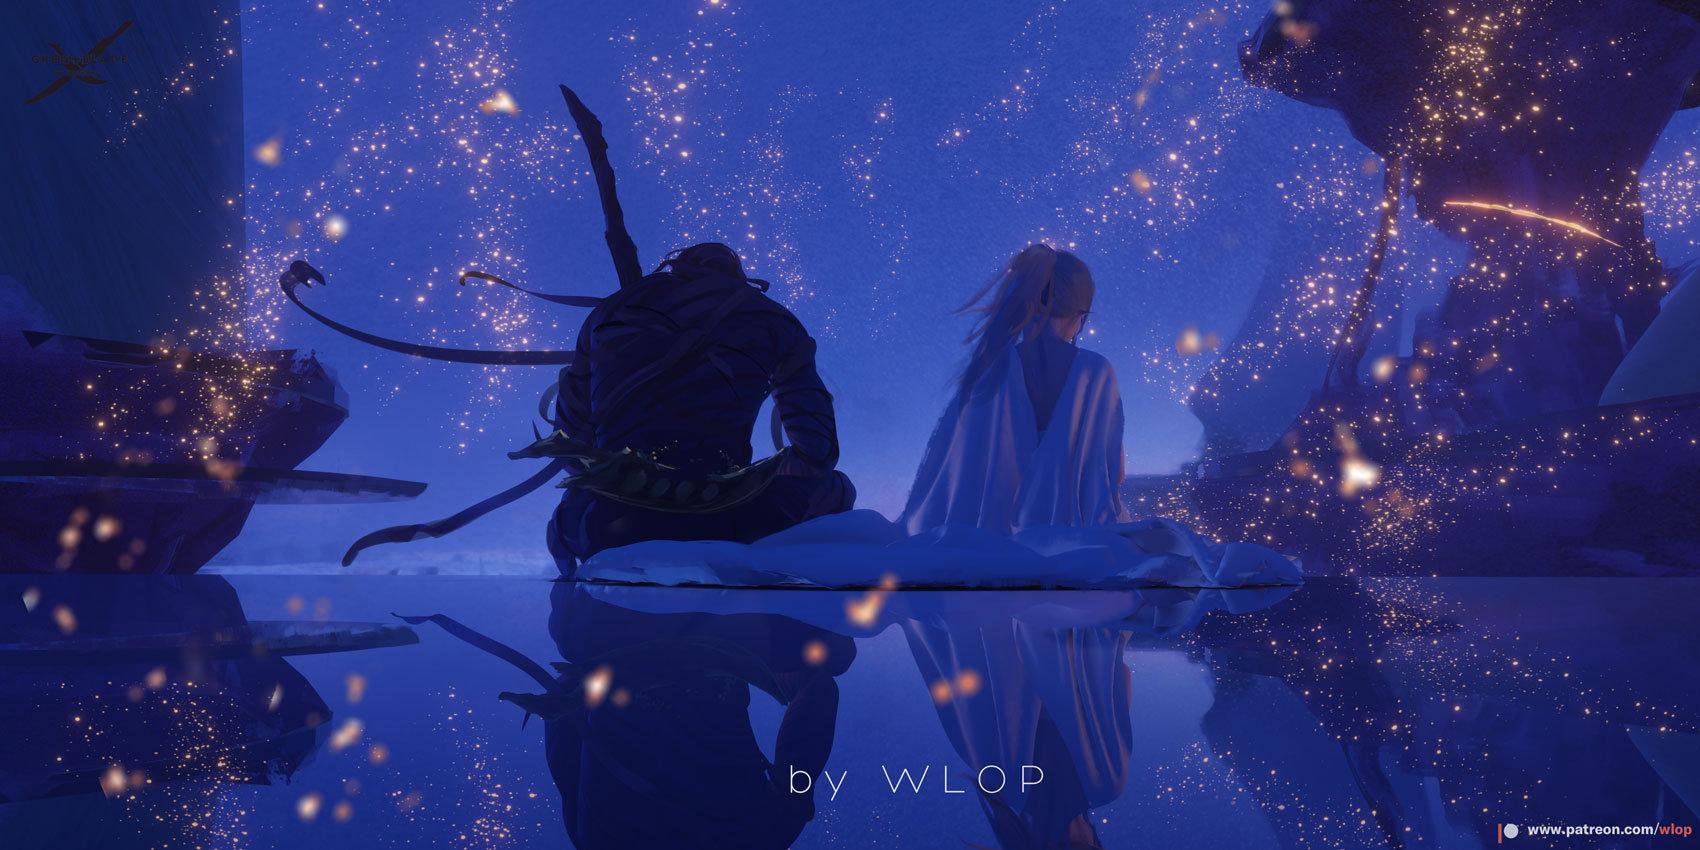 Wallpaper : WLOP, Ghost Blade, anime girls 1700x850 ...